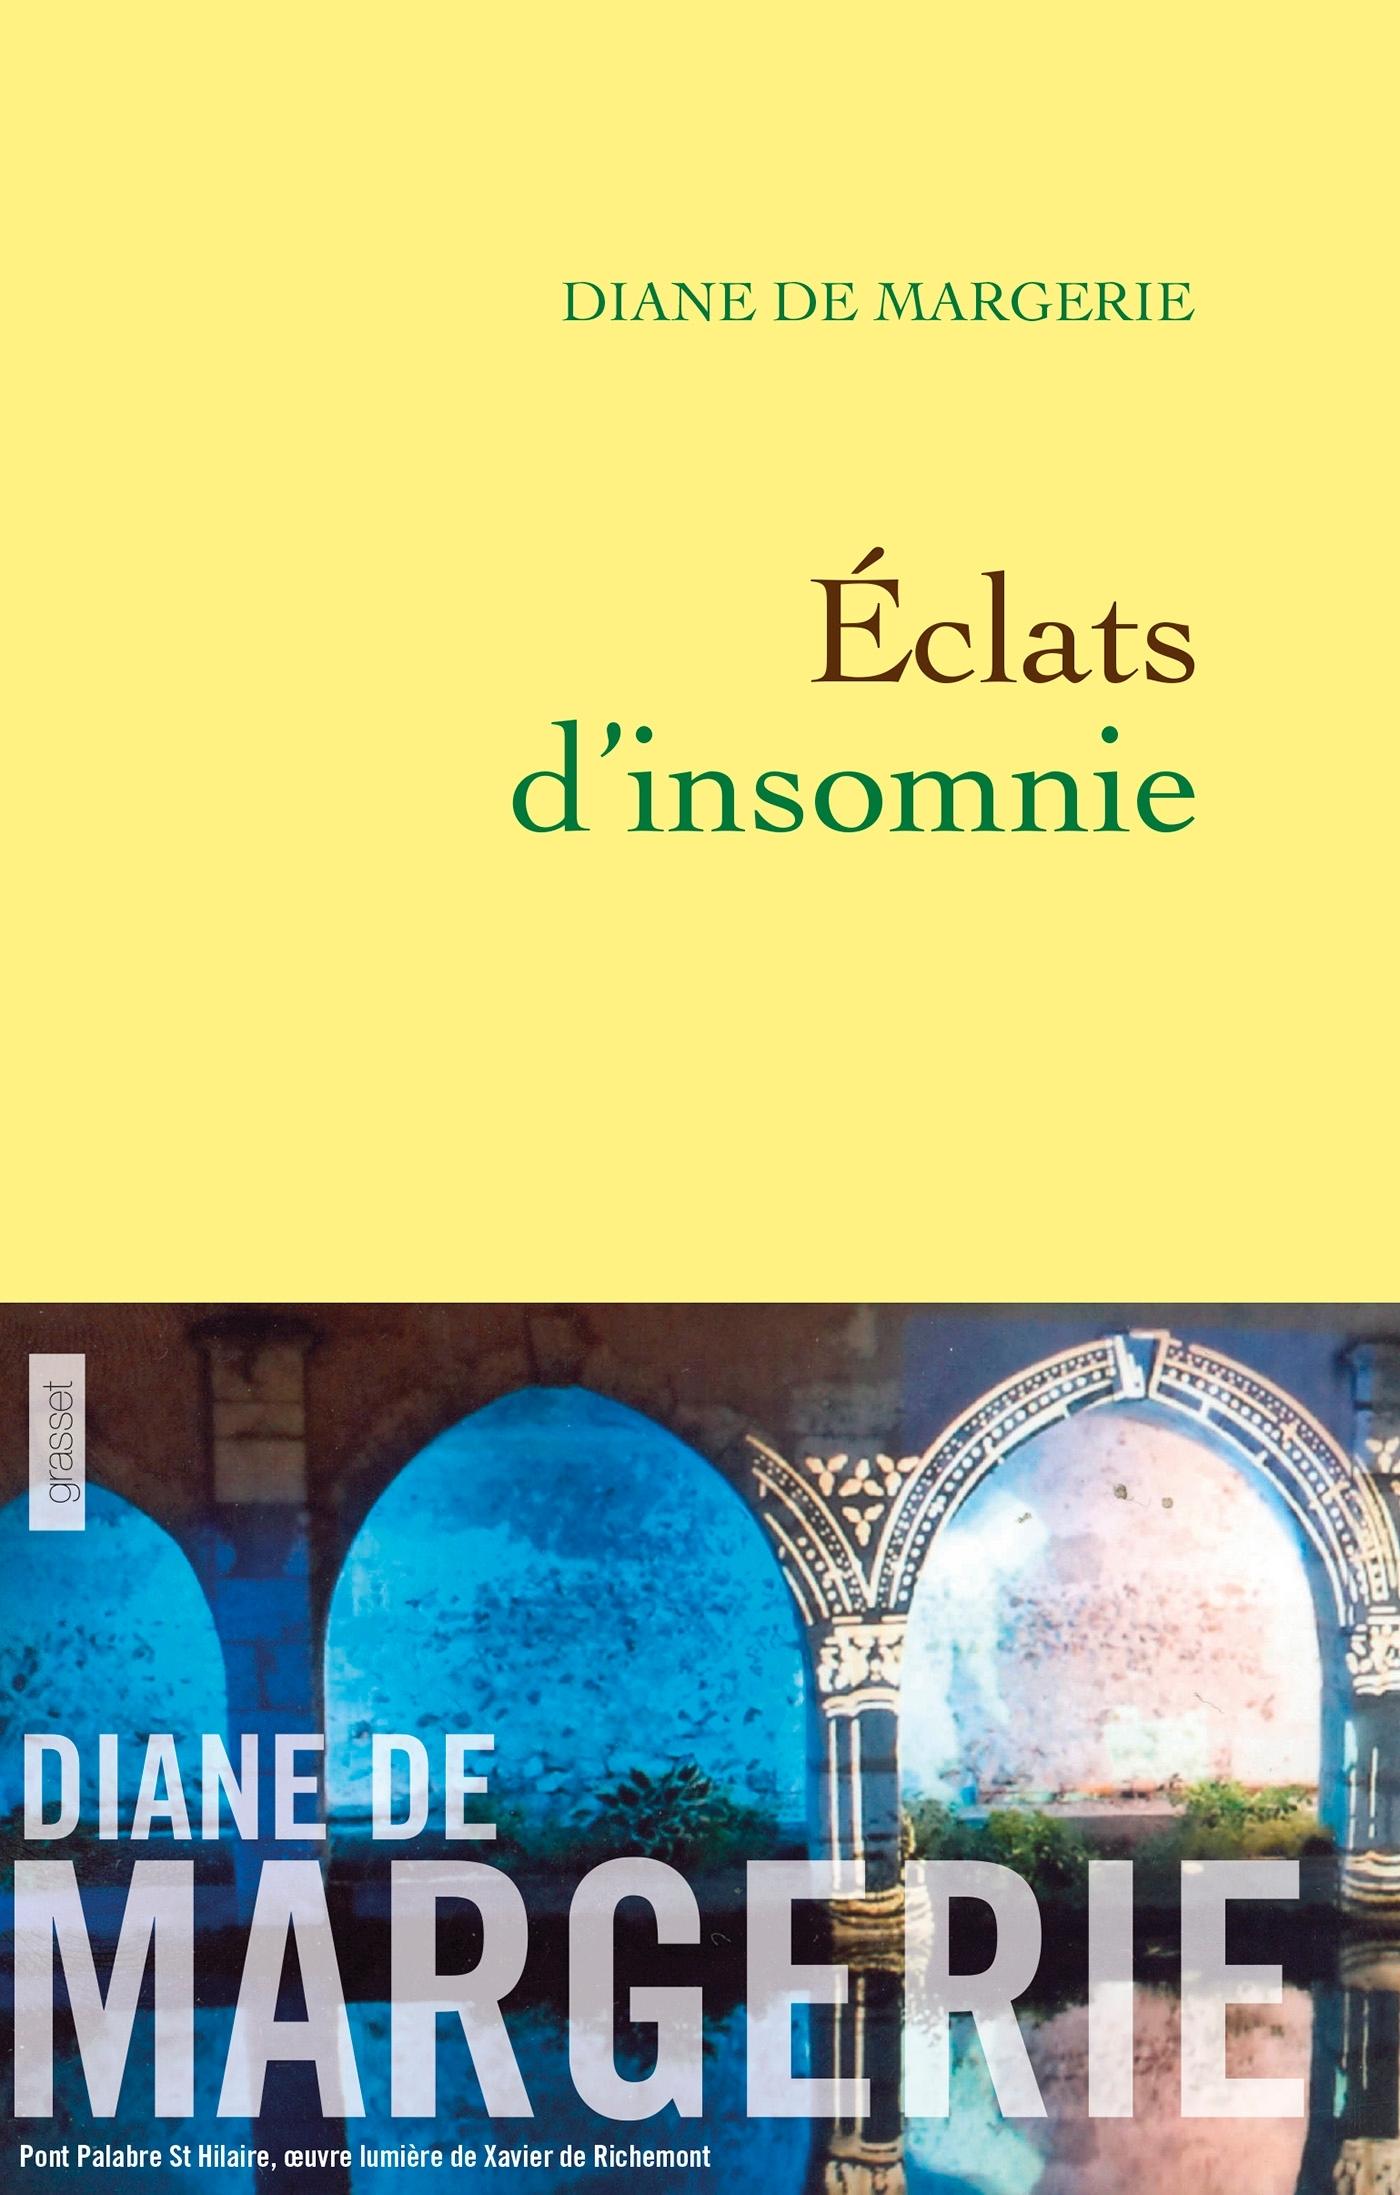 ECLATS D'INSOMNIE